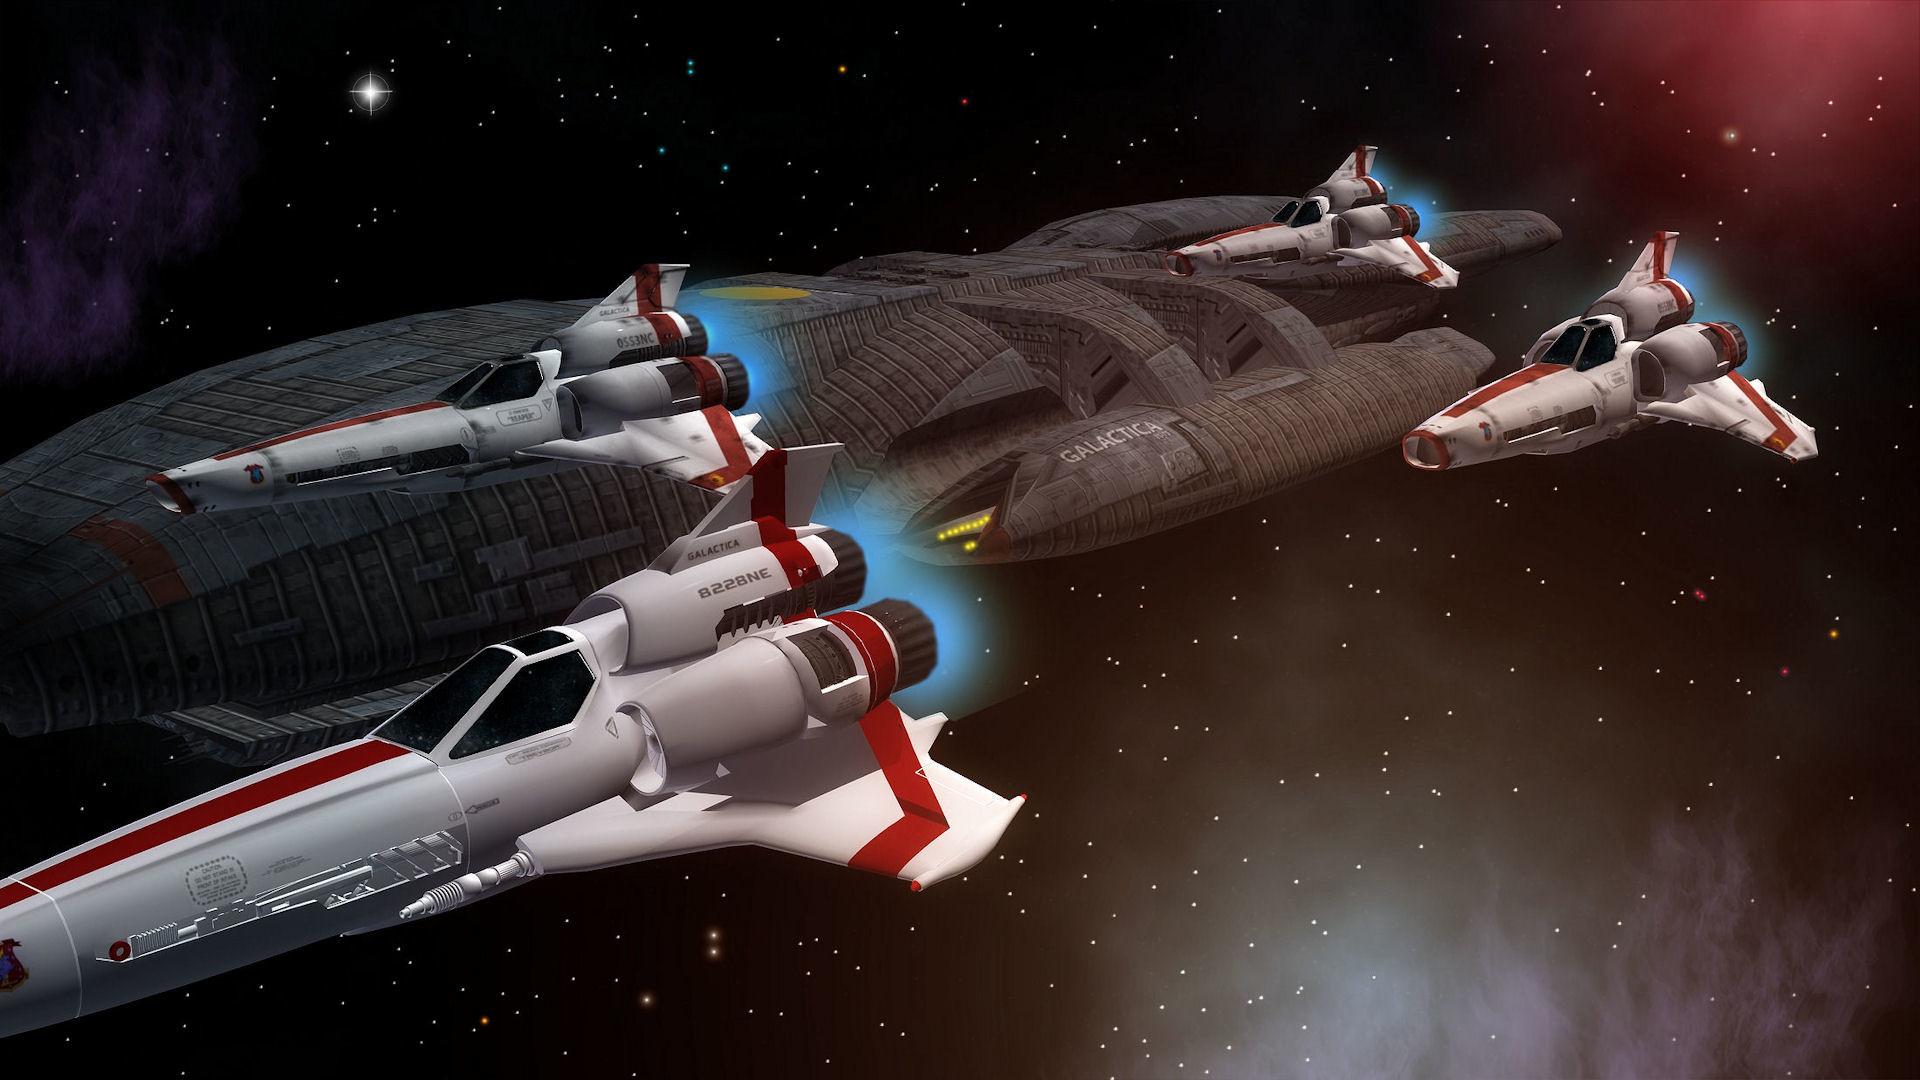 Sci Fi – Battlestar Galactica Spaceship Space Wallpaper